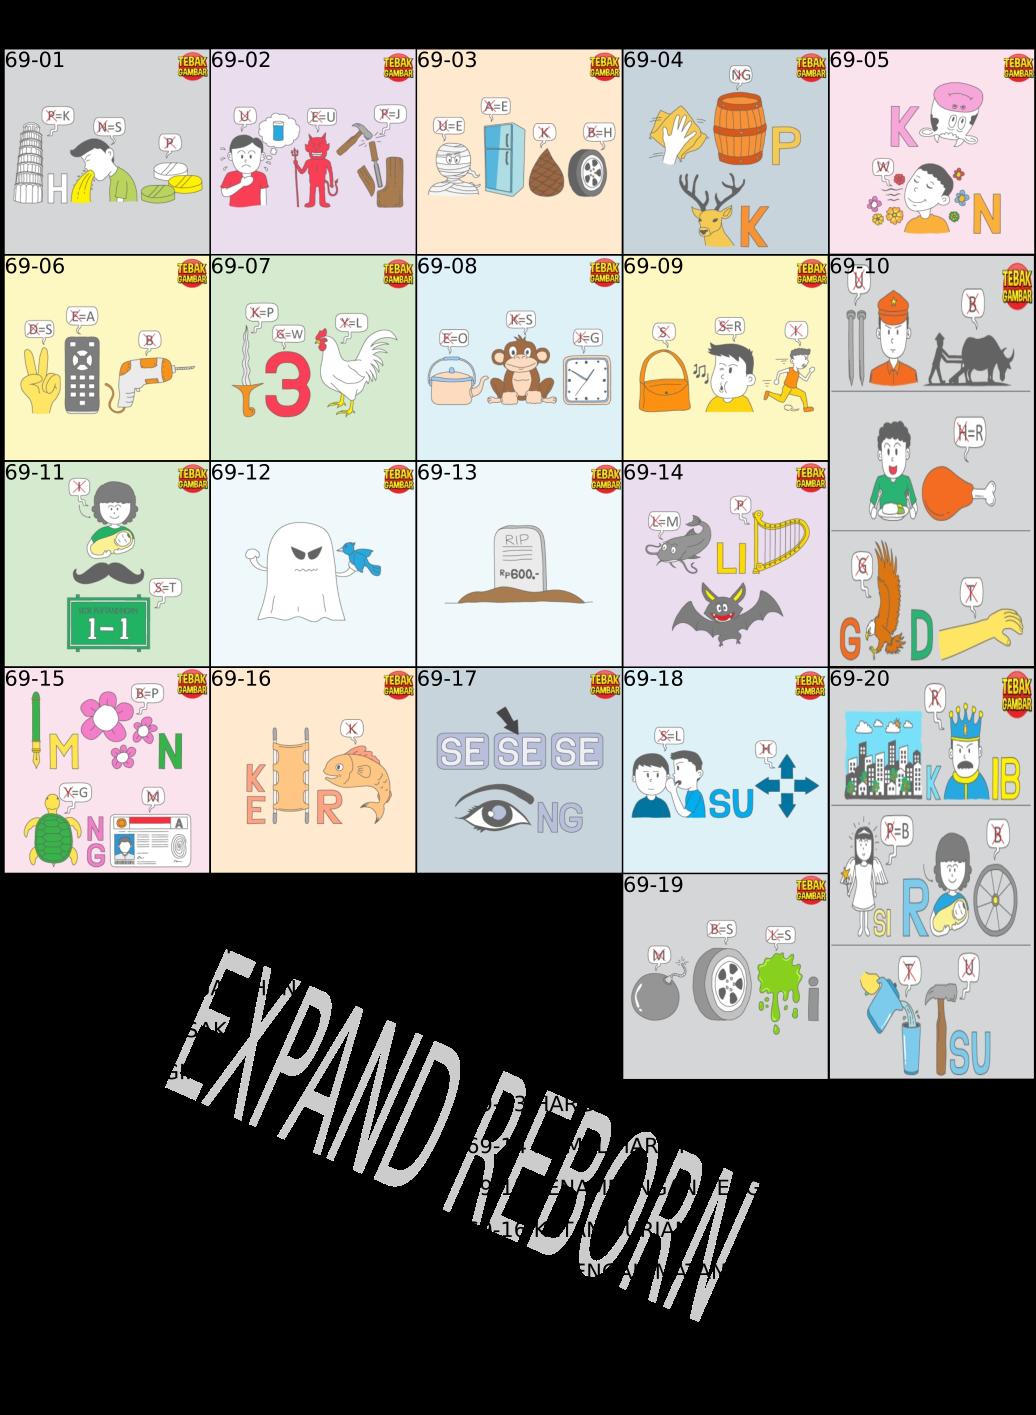 Expand Reborn Game Android Tebak Gambar Kunci Jawaban Part 5